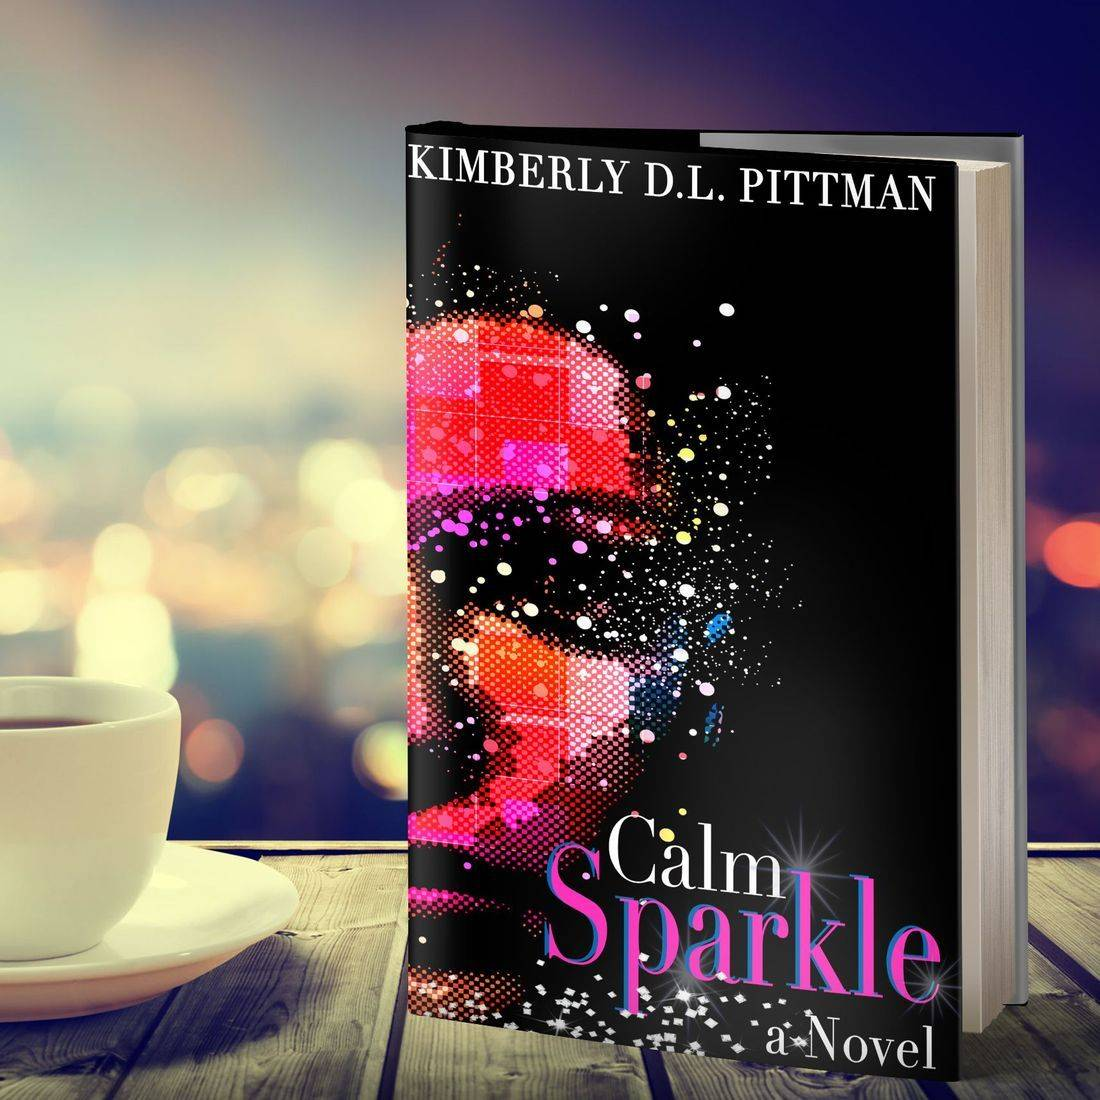 Calm Sparkle the novel by Kimberly D.L. Pittman